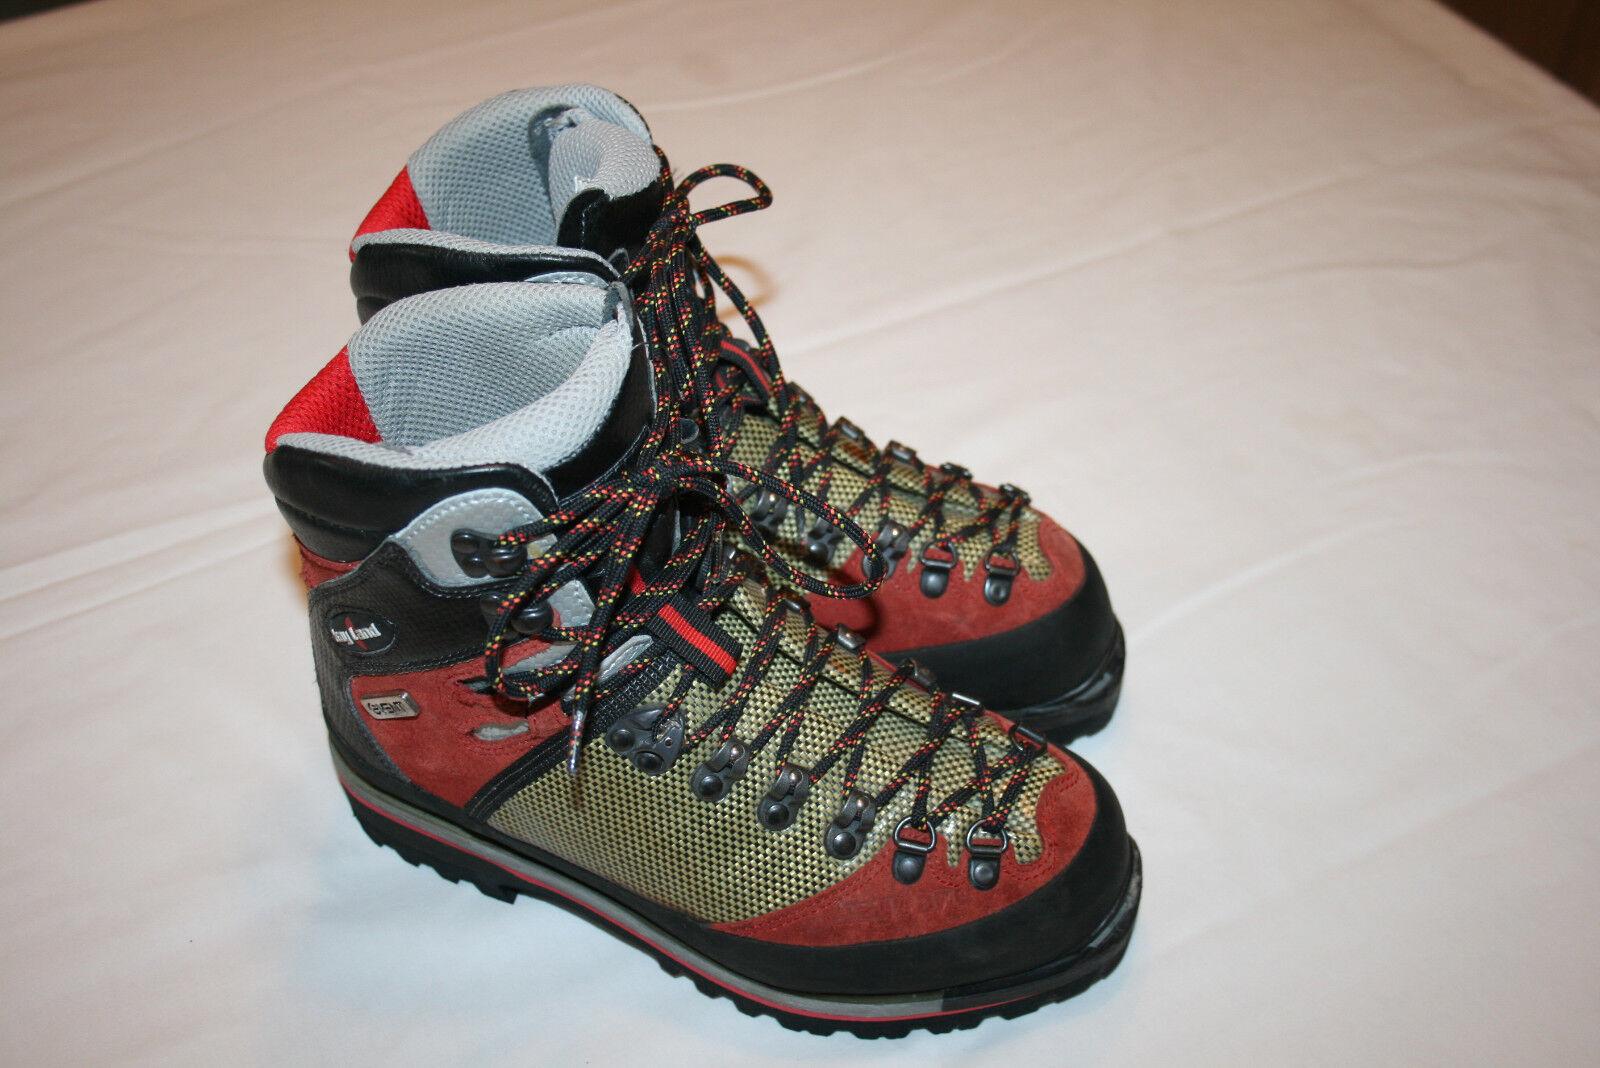 Kayland Super Ice Climbing Stiefel Primaloft 200 G M sz 6 W sz 7.5 EUC Italien